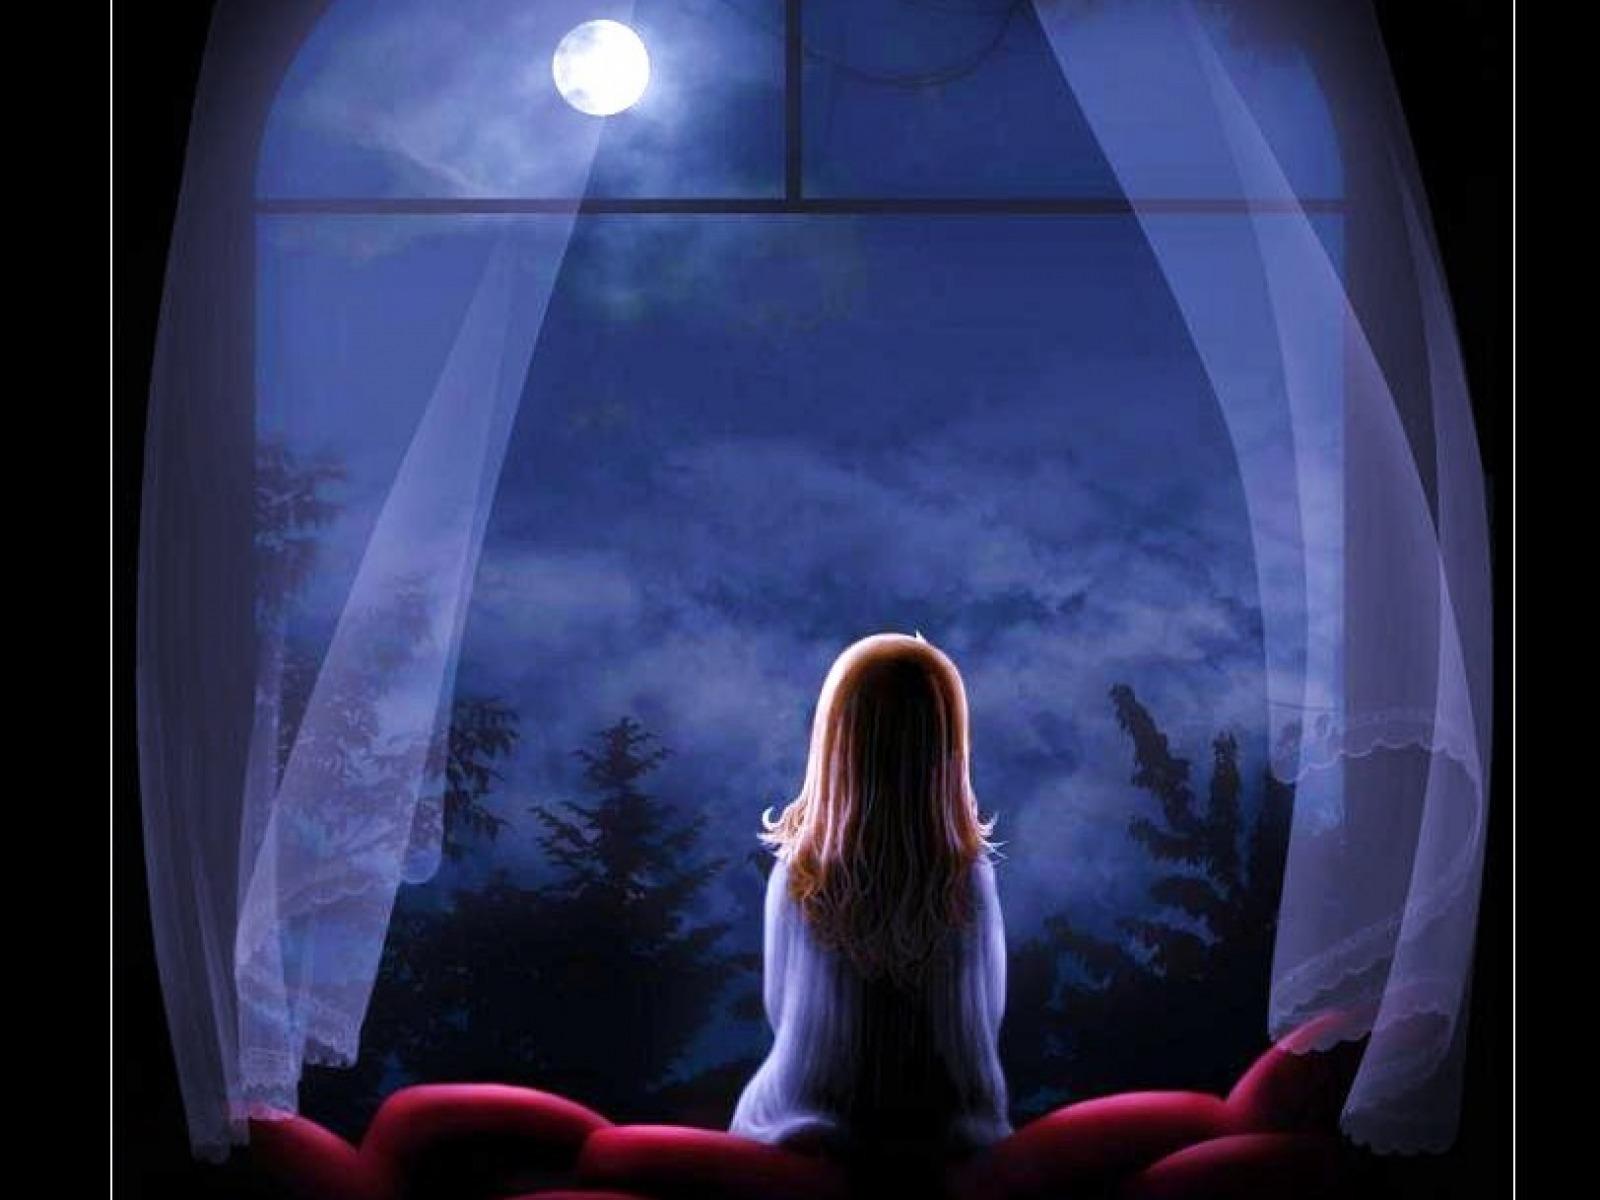 Slovenski ljudski običaji: Luna zaveznica ljudem